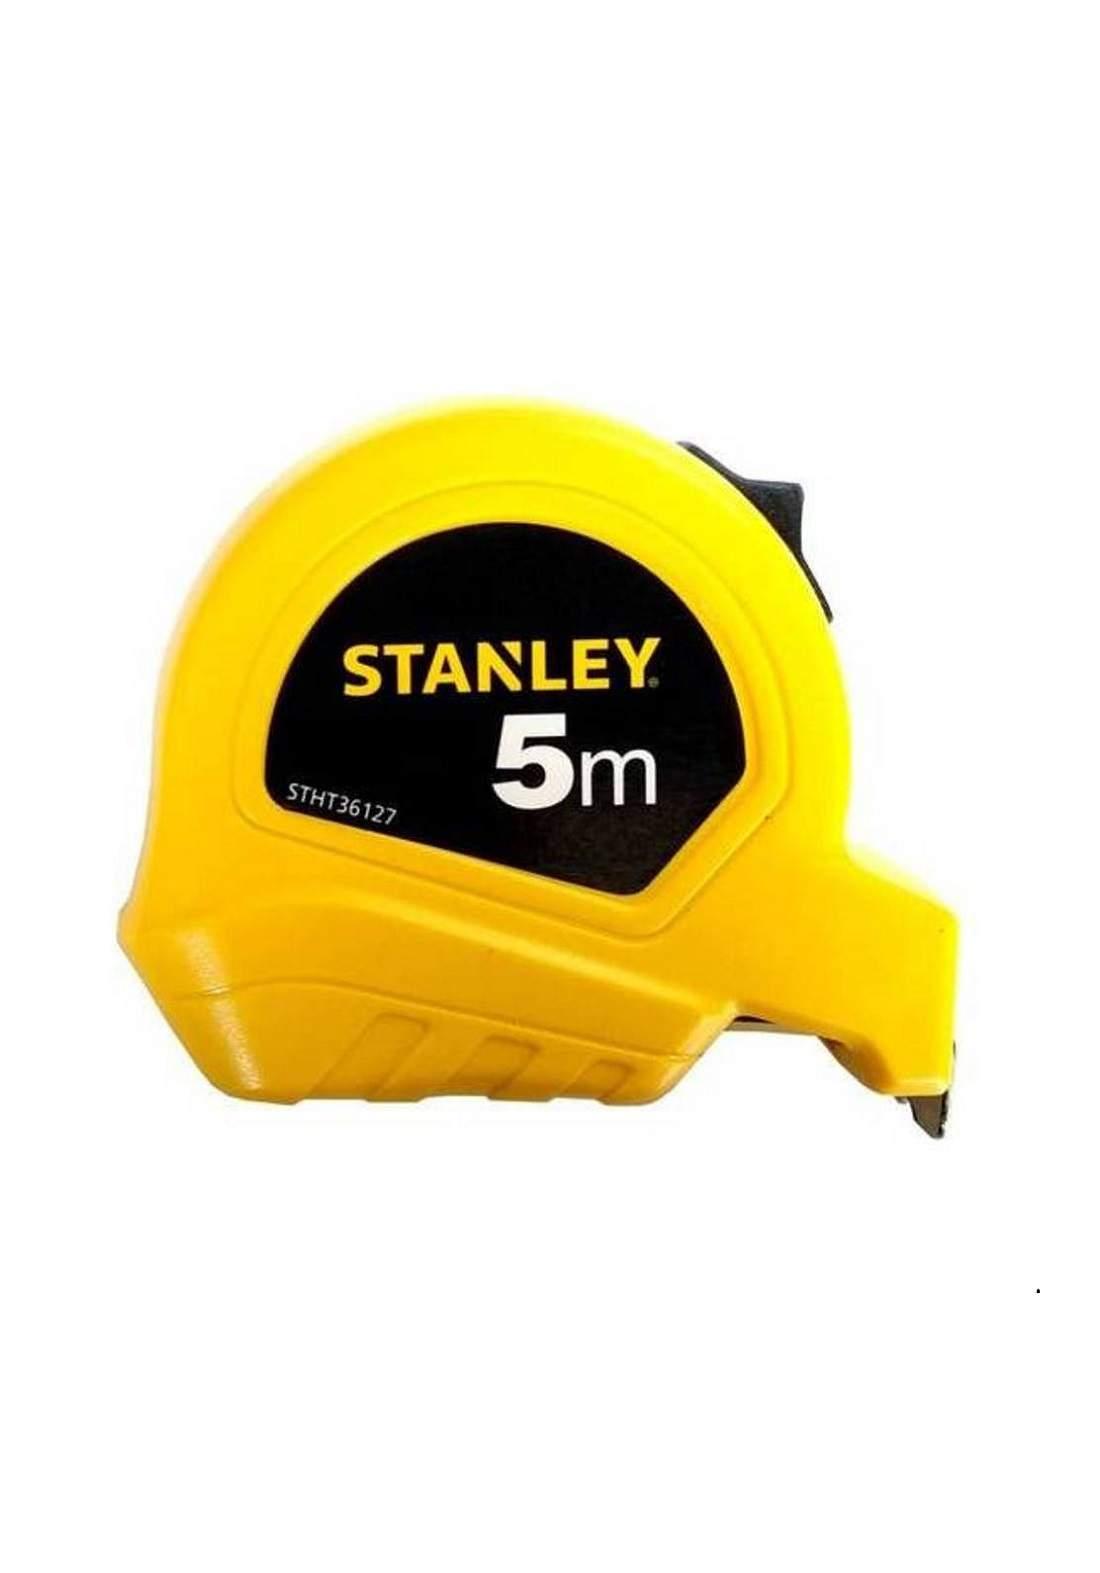 Stanley STHT36127-812  Measuring Tape 5M/E x 19mm فيتة  5 م